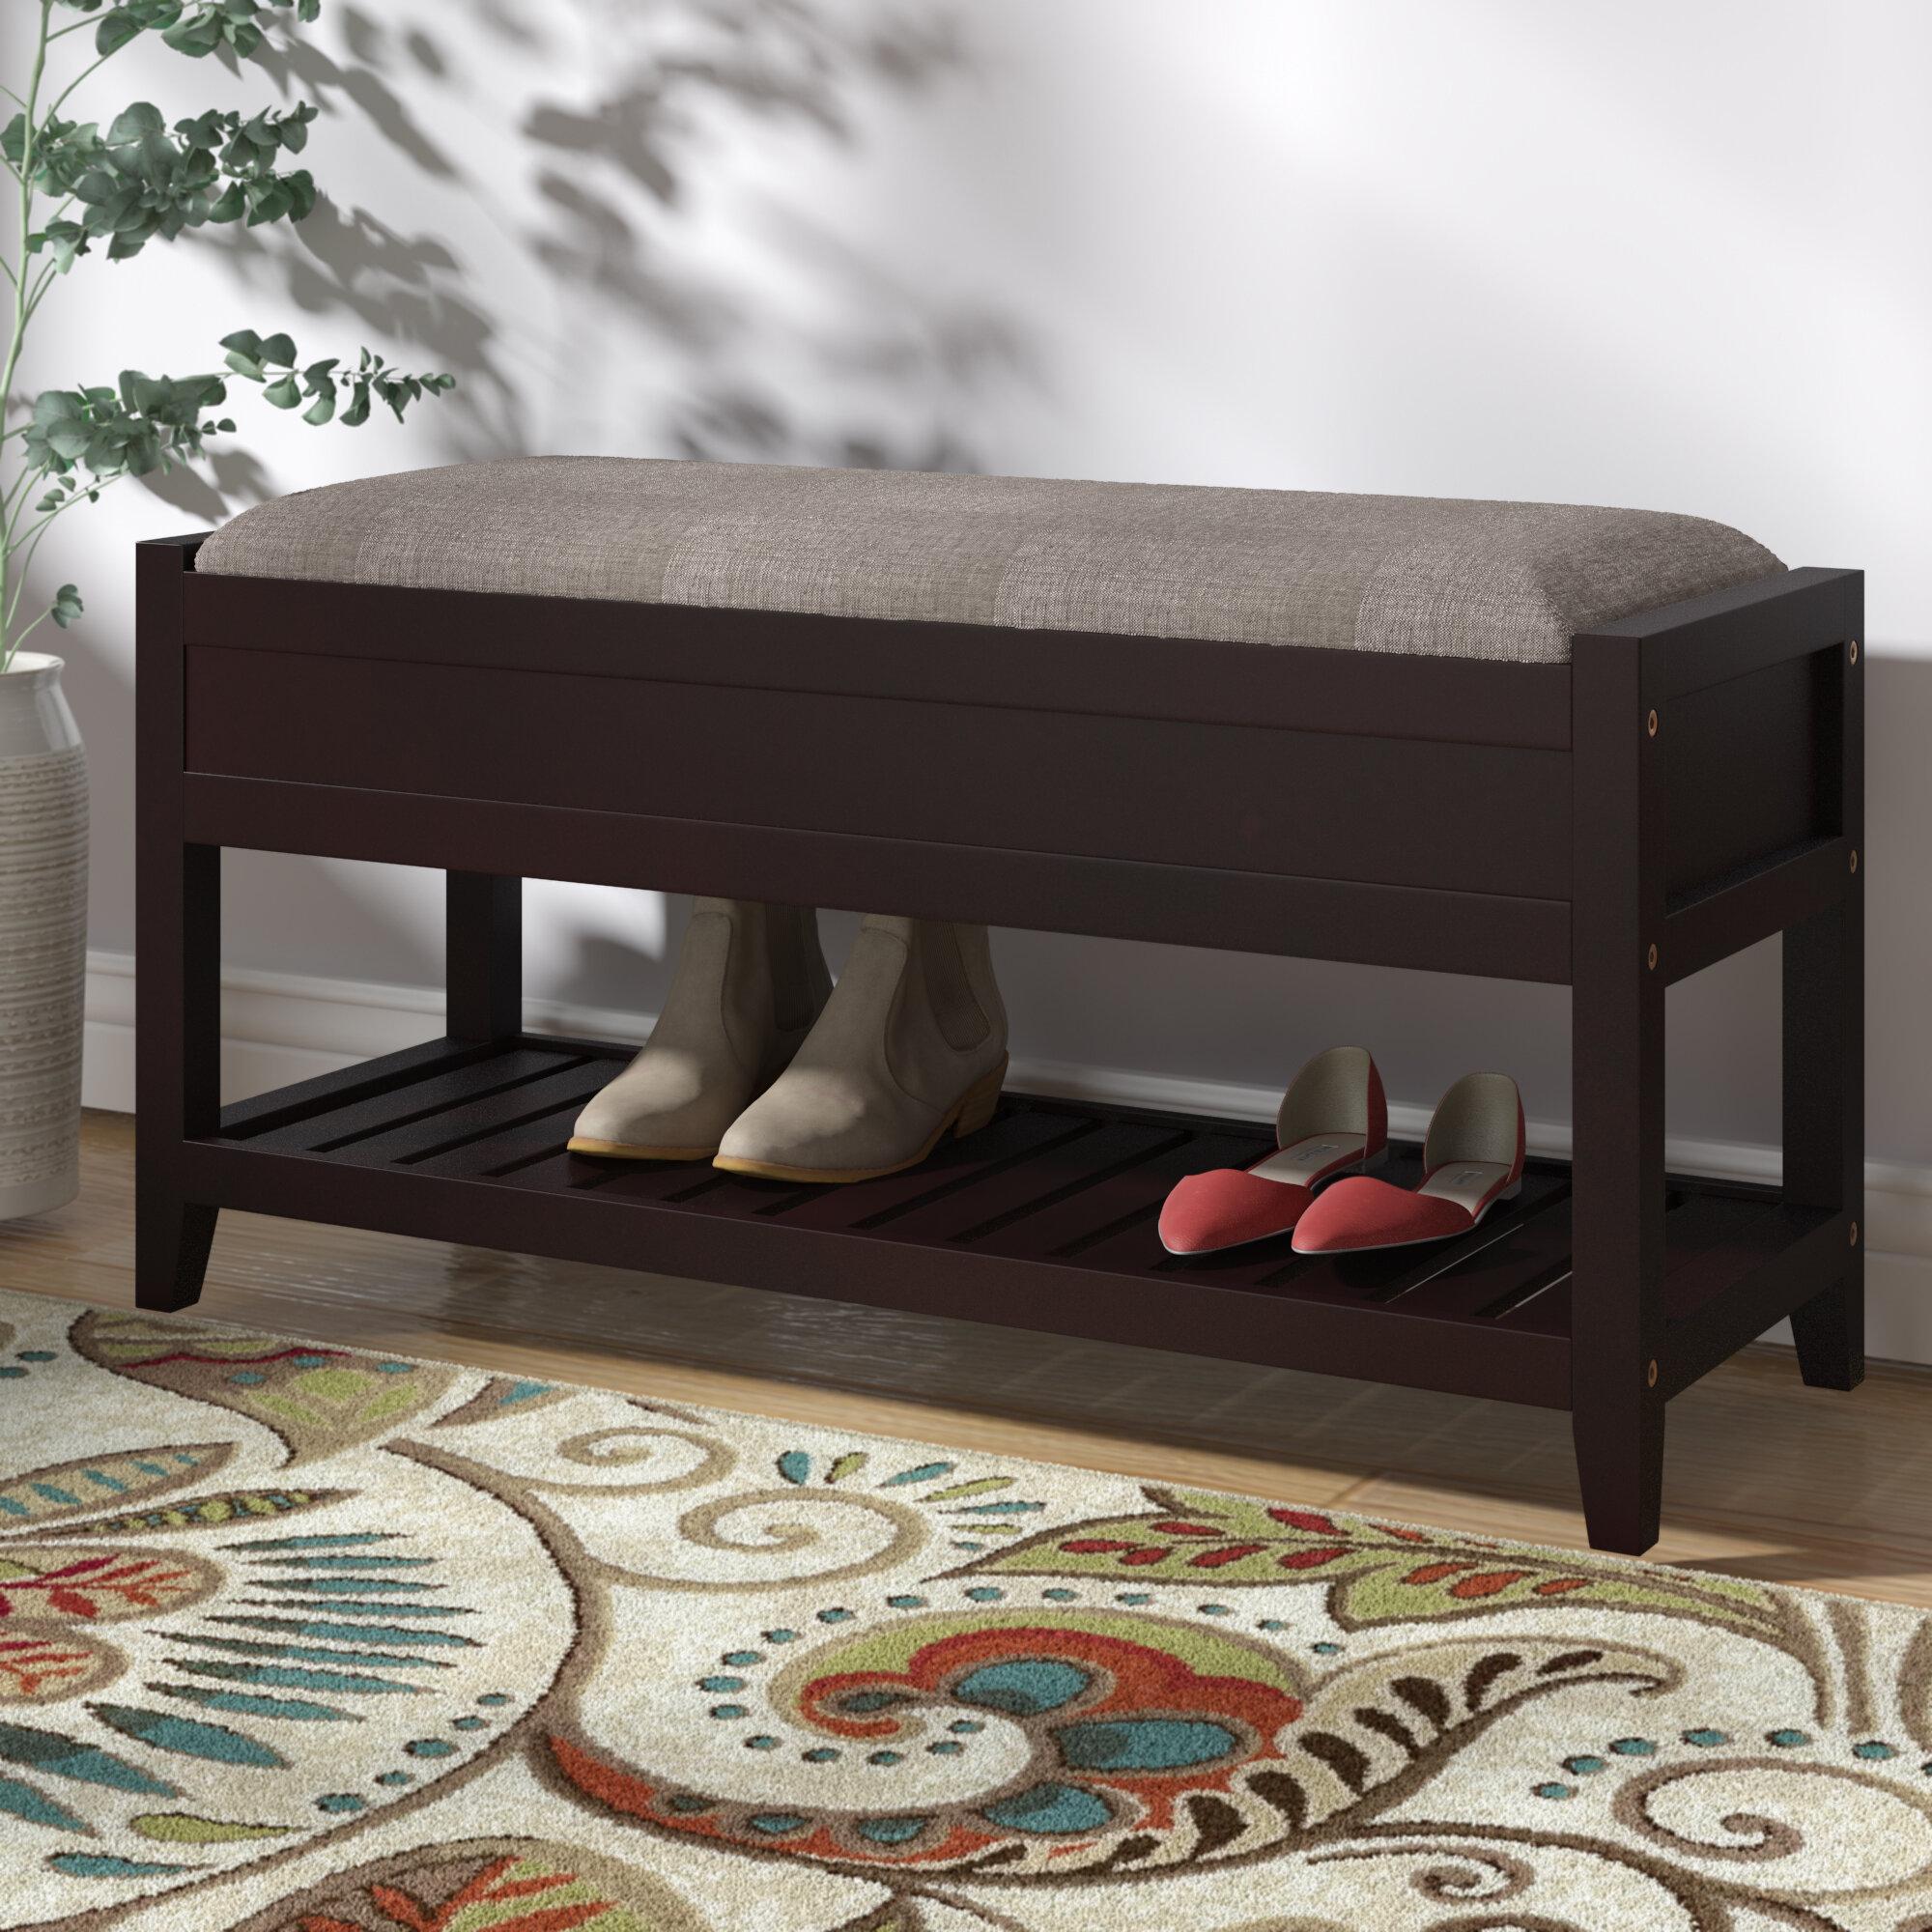 Incroyable Charlton Home Lambrecht Seating Bench With Shoe Storage U0026 Reviews | Wayfair